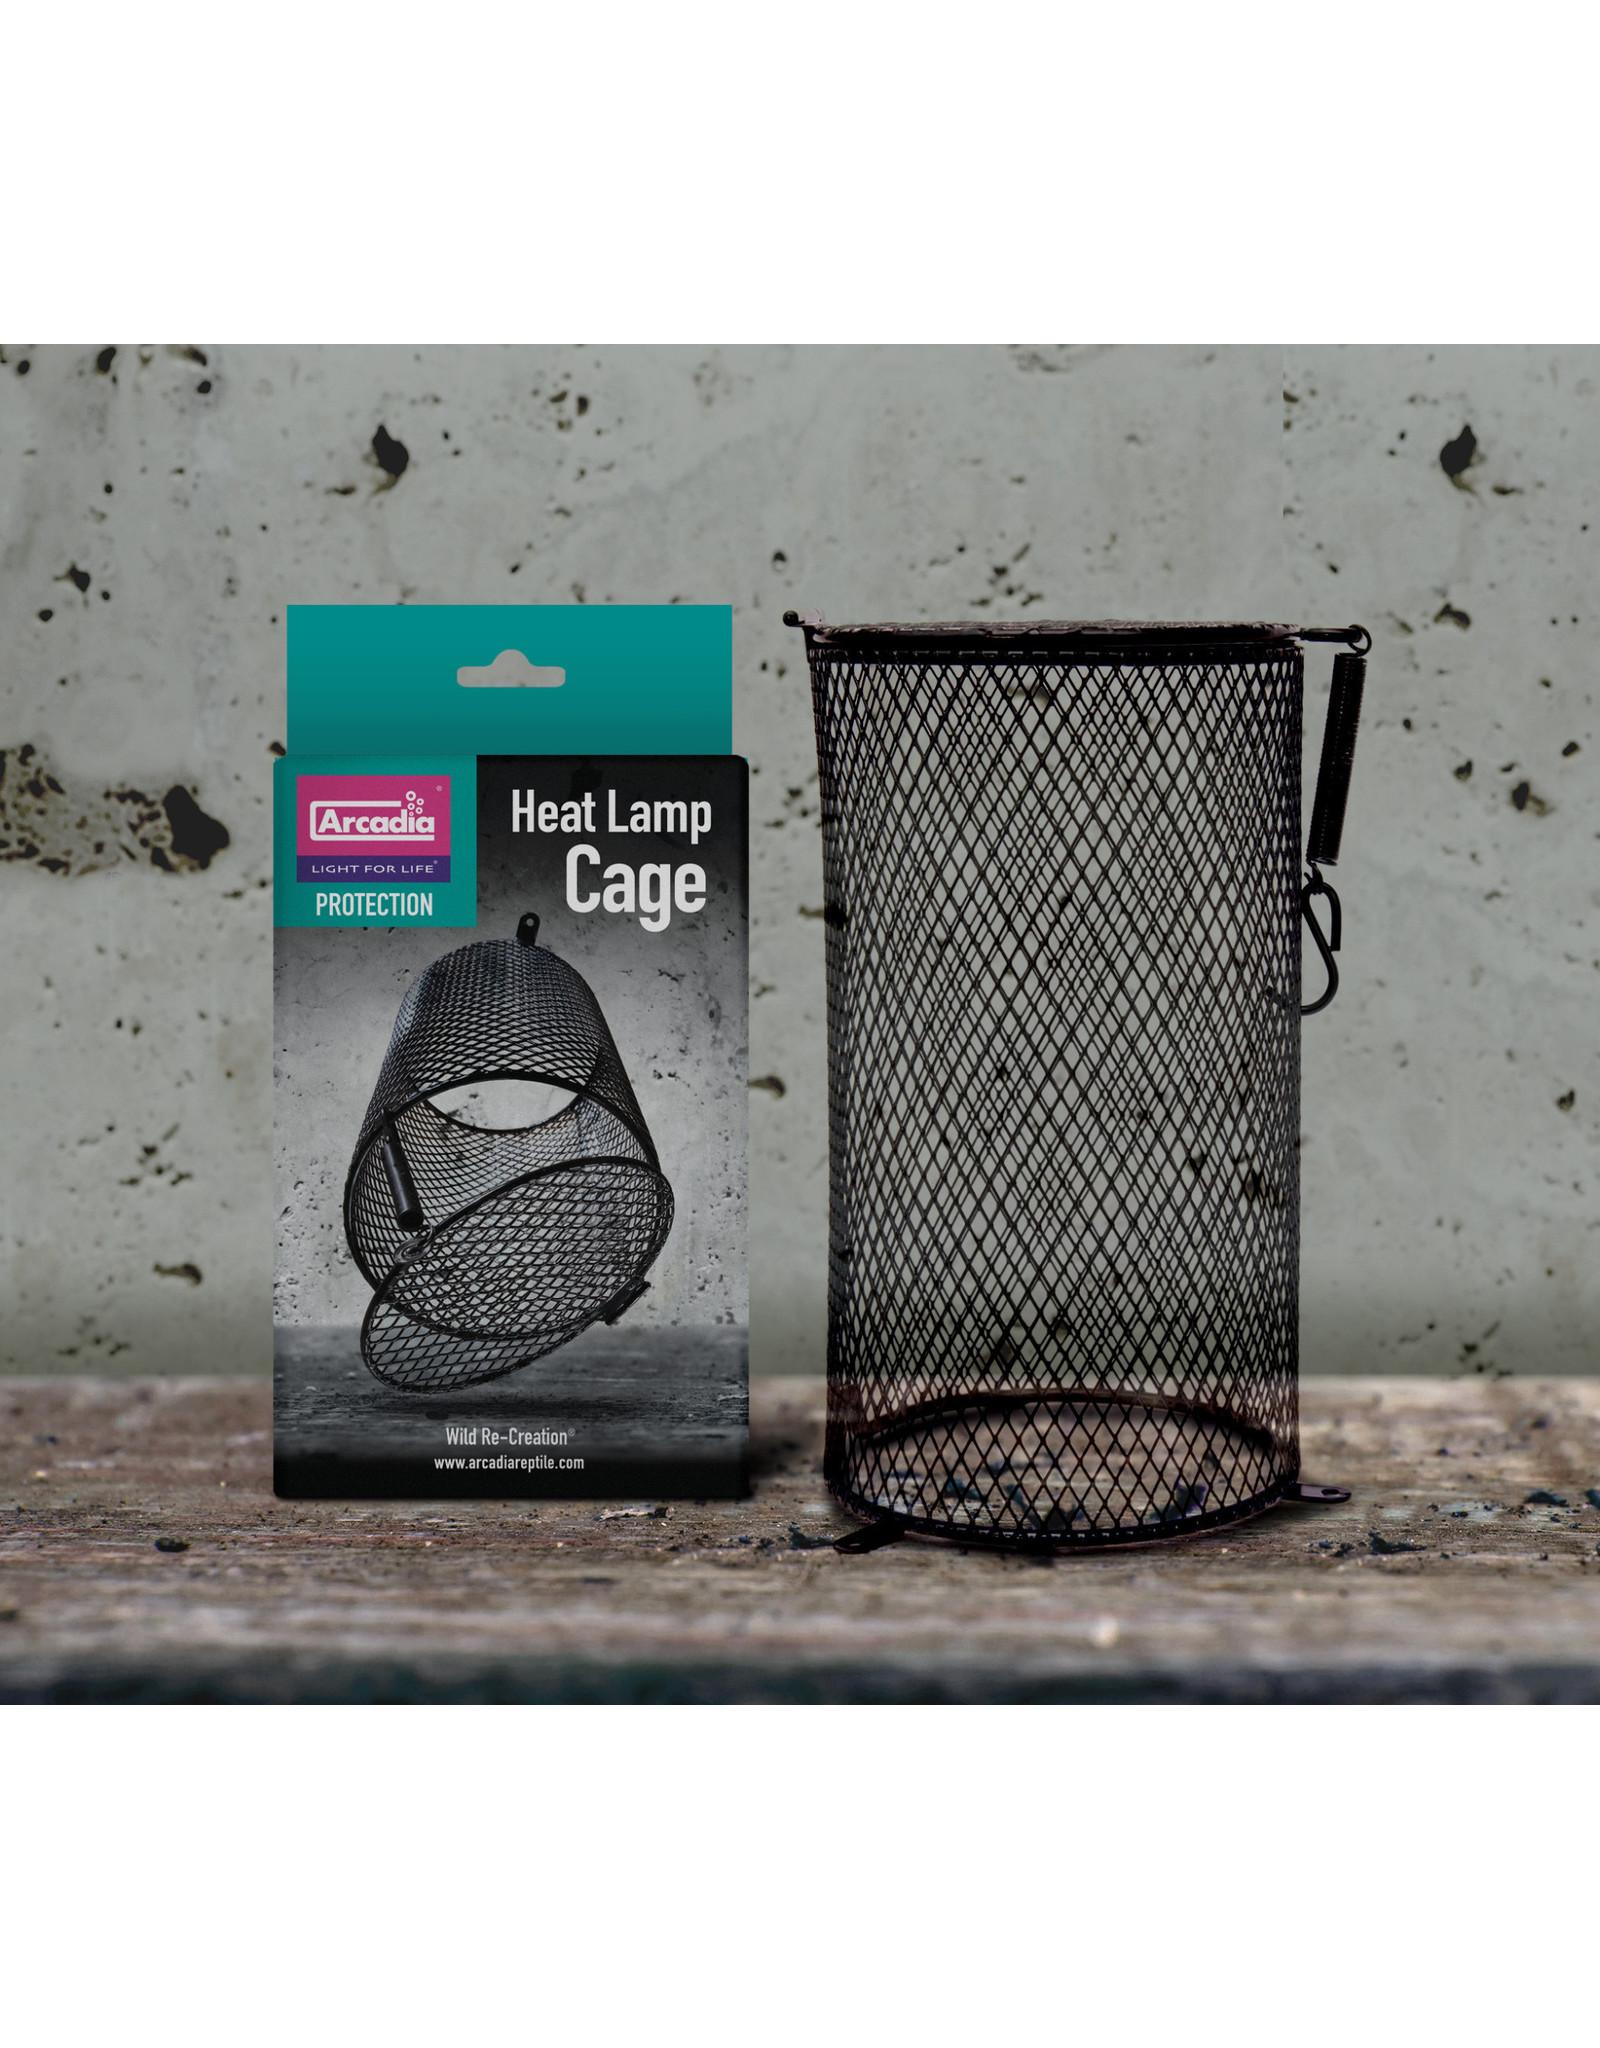 Arcadia AR Heat Lamp Cage